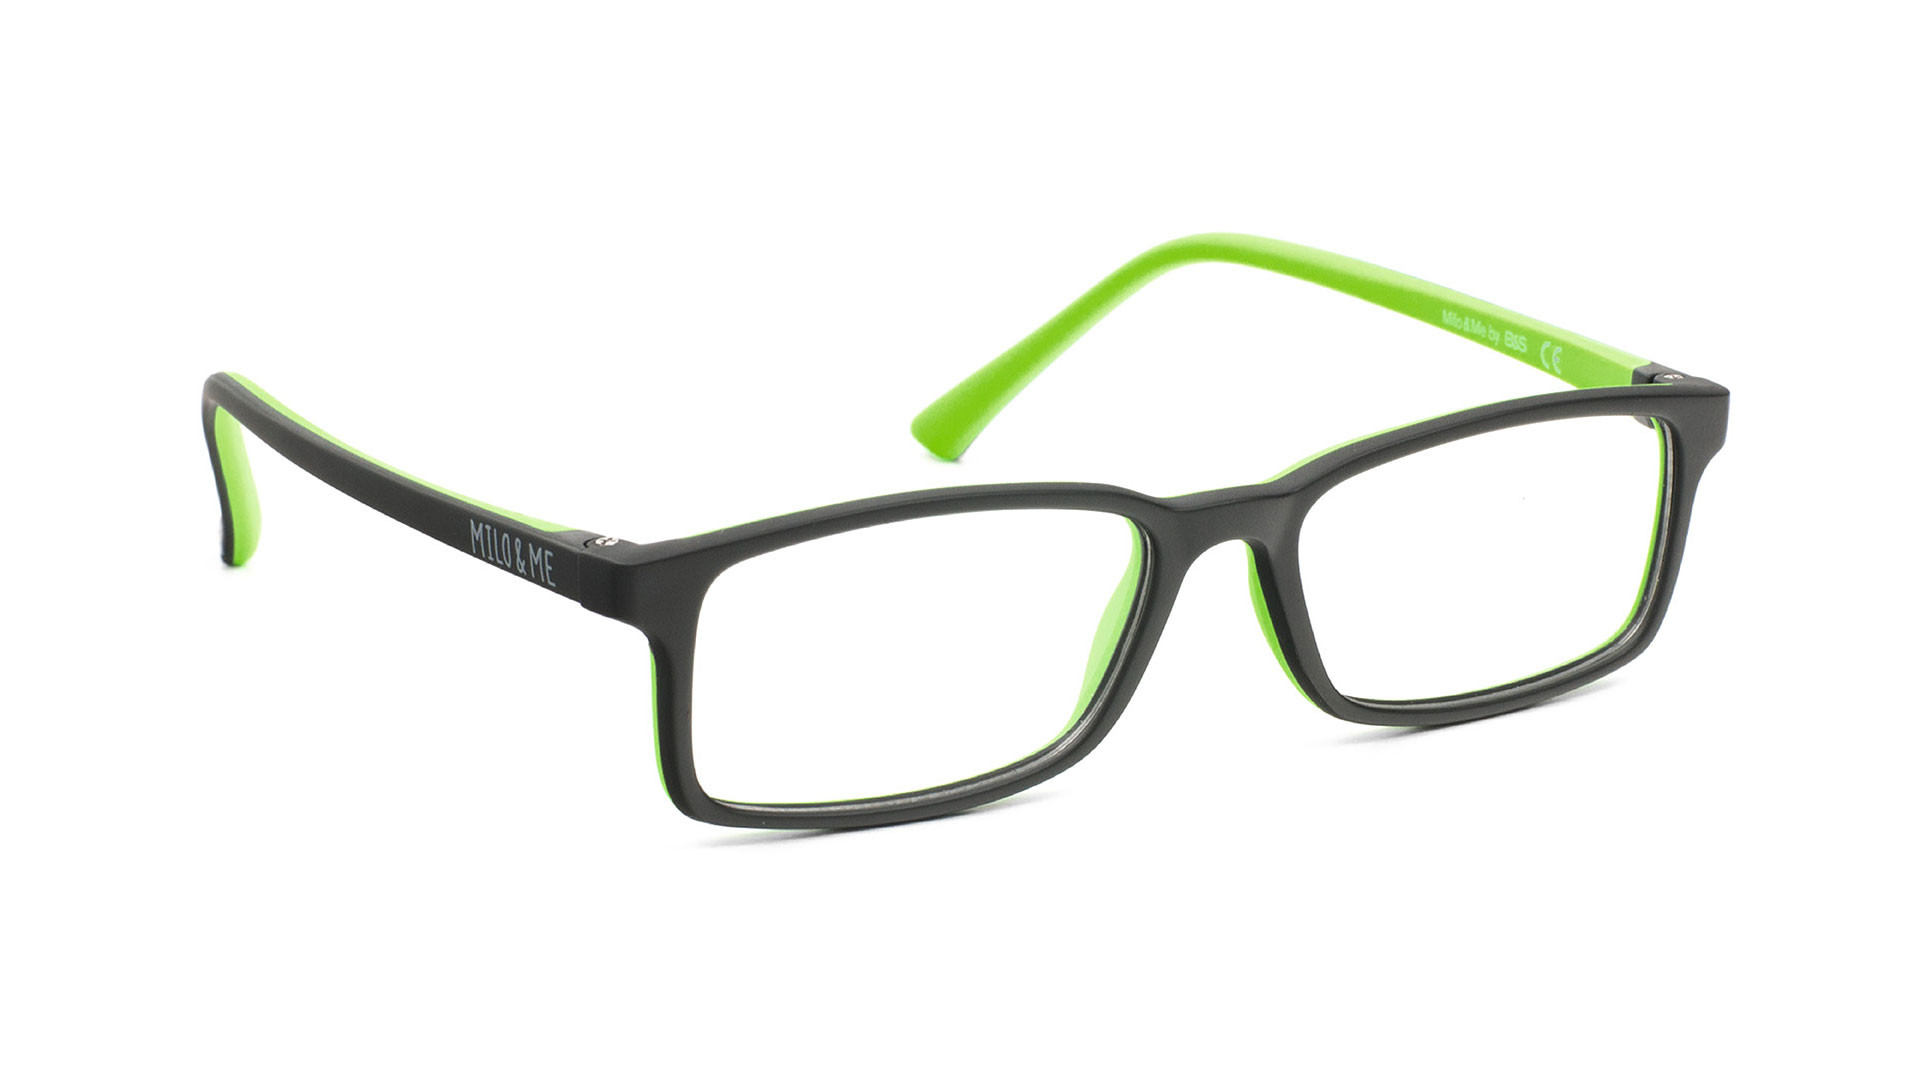 BlackApple Green H85021-12 - Milo & Me Eyewear - Optimum RX Lens Specialists